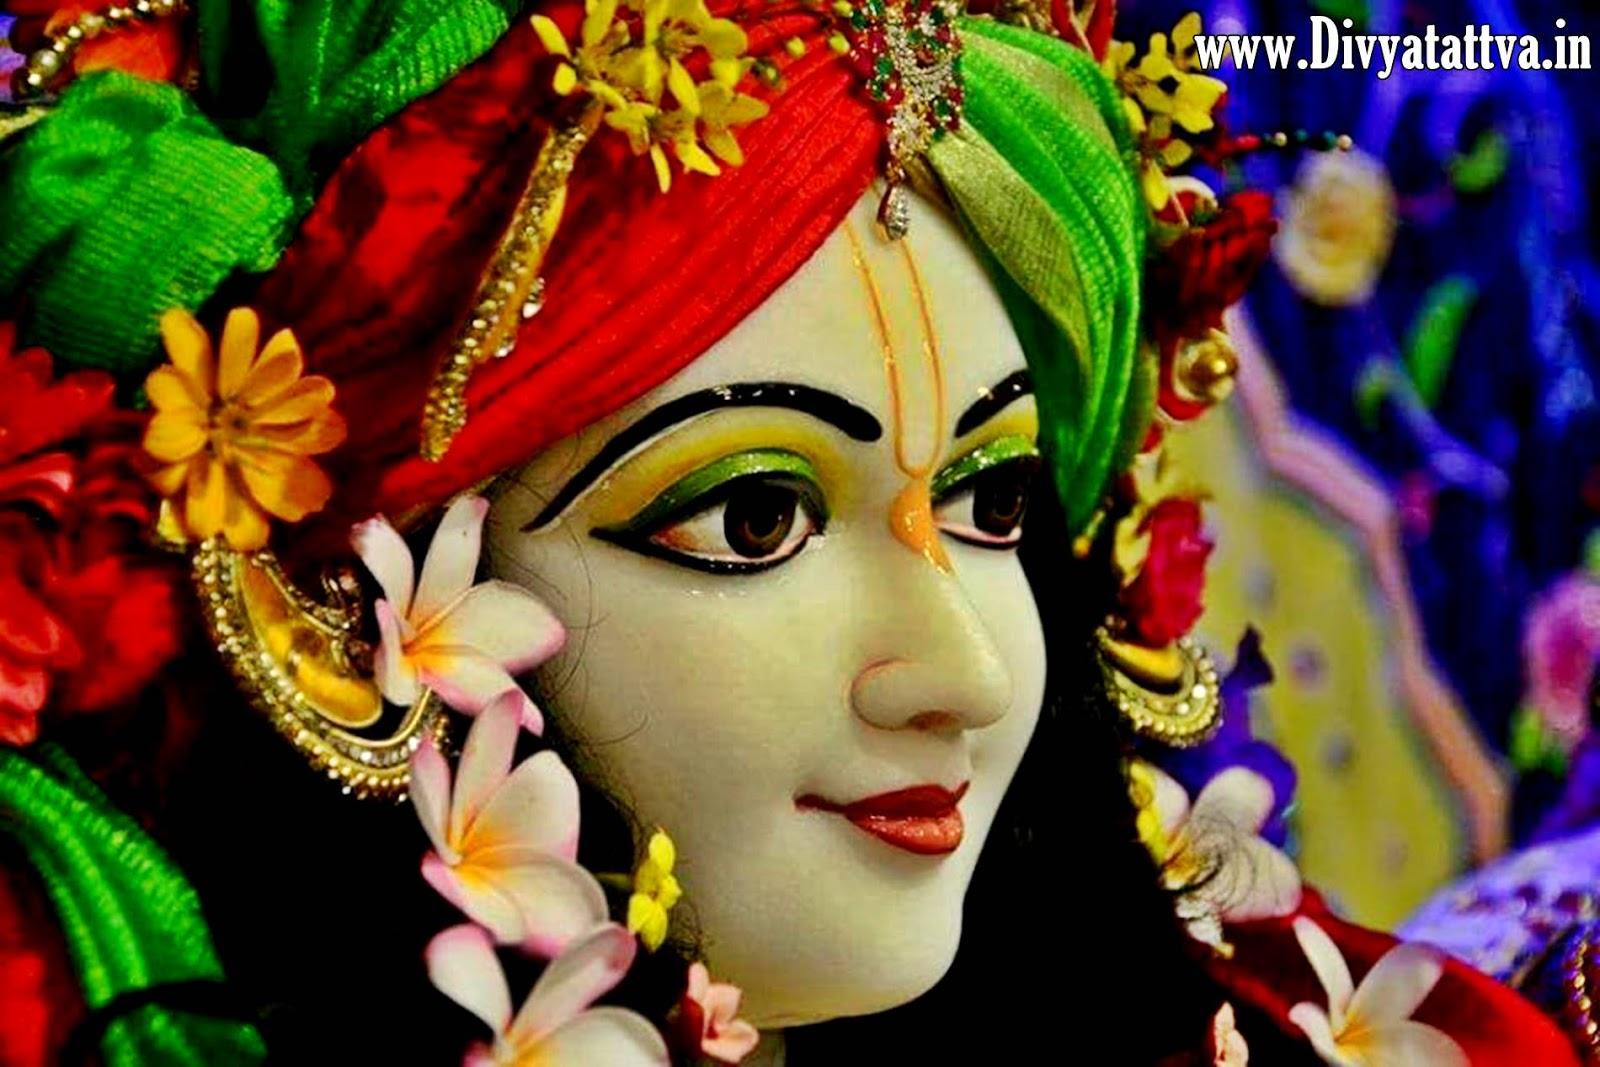 krishna hd wallpaper for mobile desktop hindu god govinda www.divyatattva.in